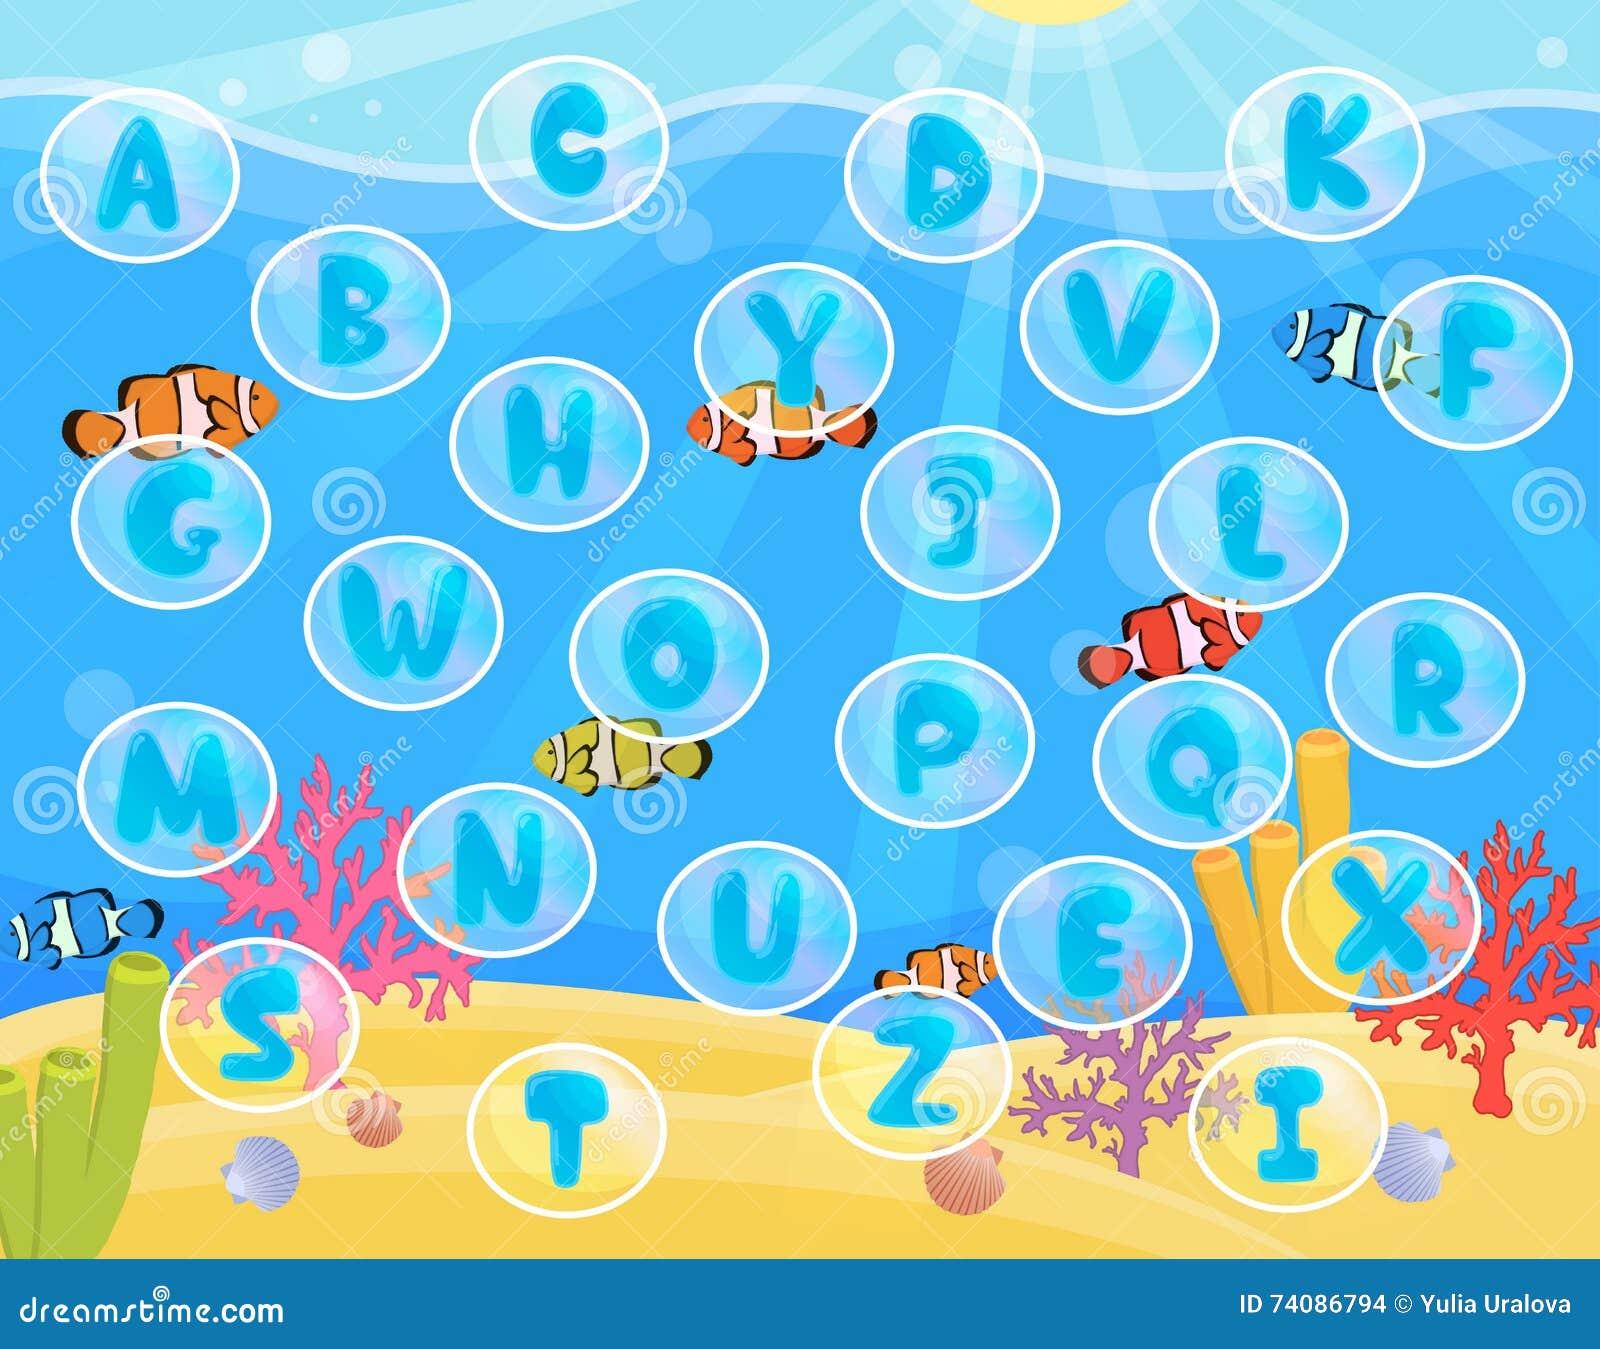 Children Activity Play Mat For Alphabet Learning. Stock